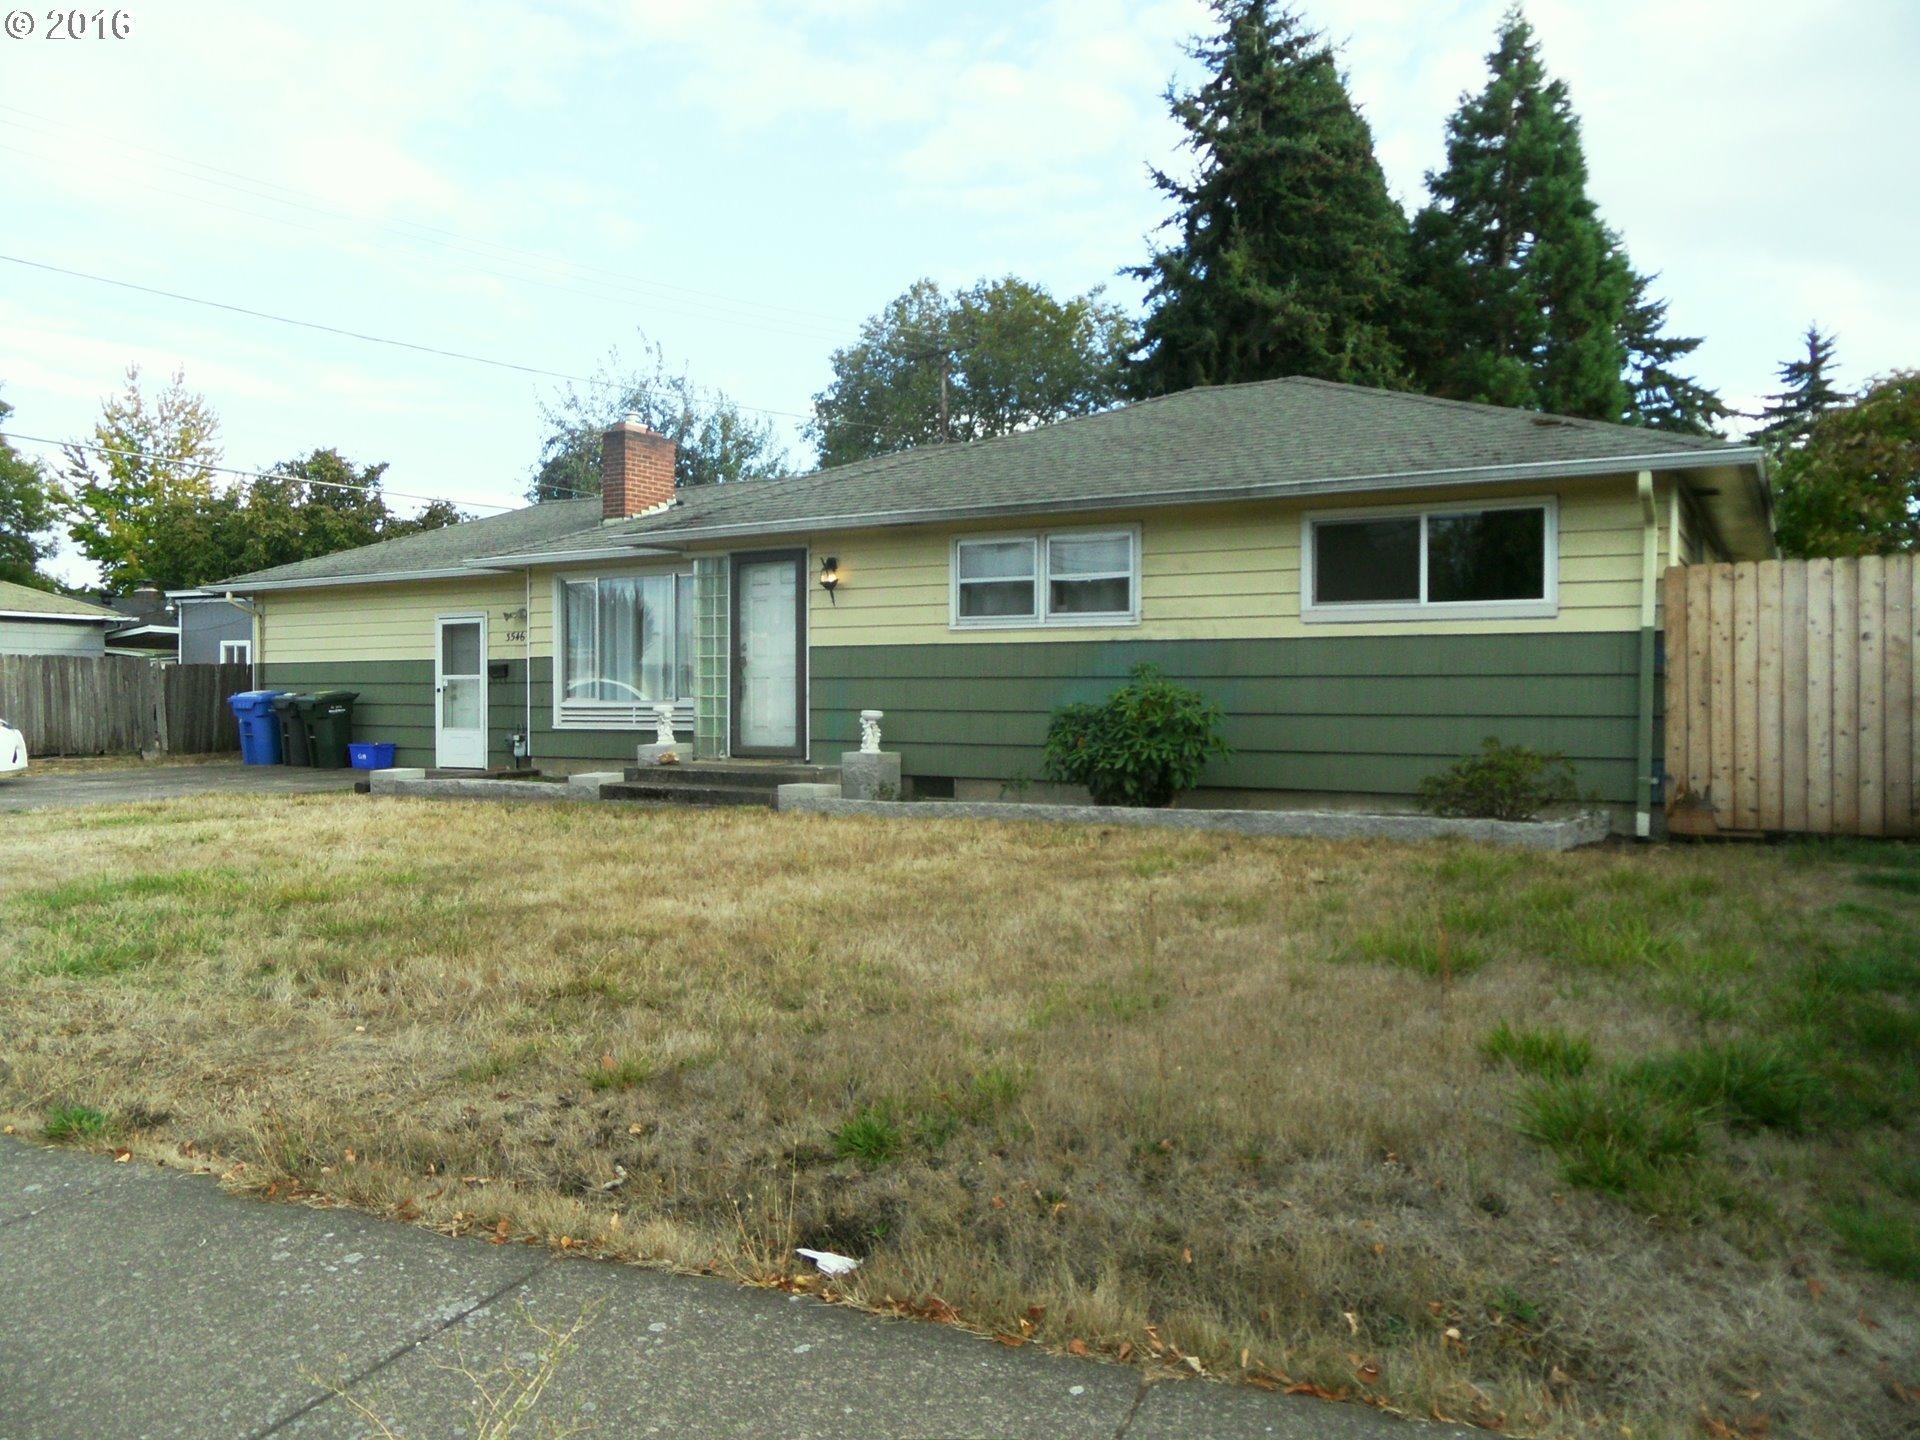 3546 royal ave eugene or 97402 us eugene home for sale